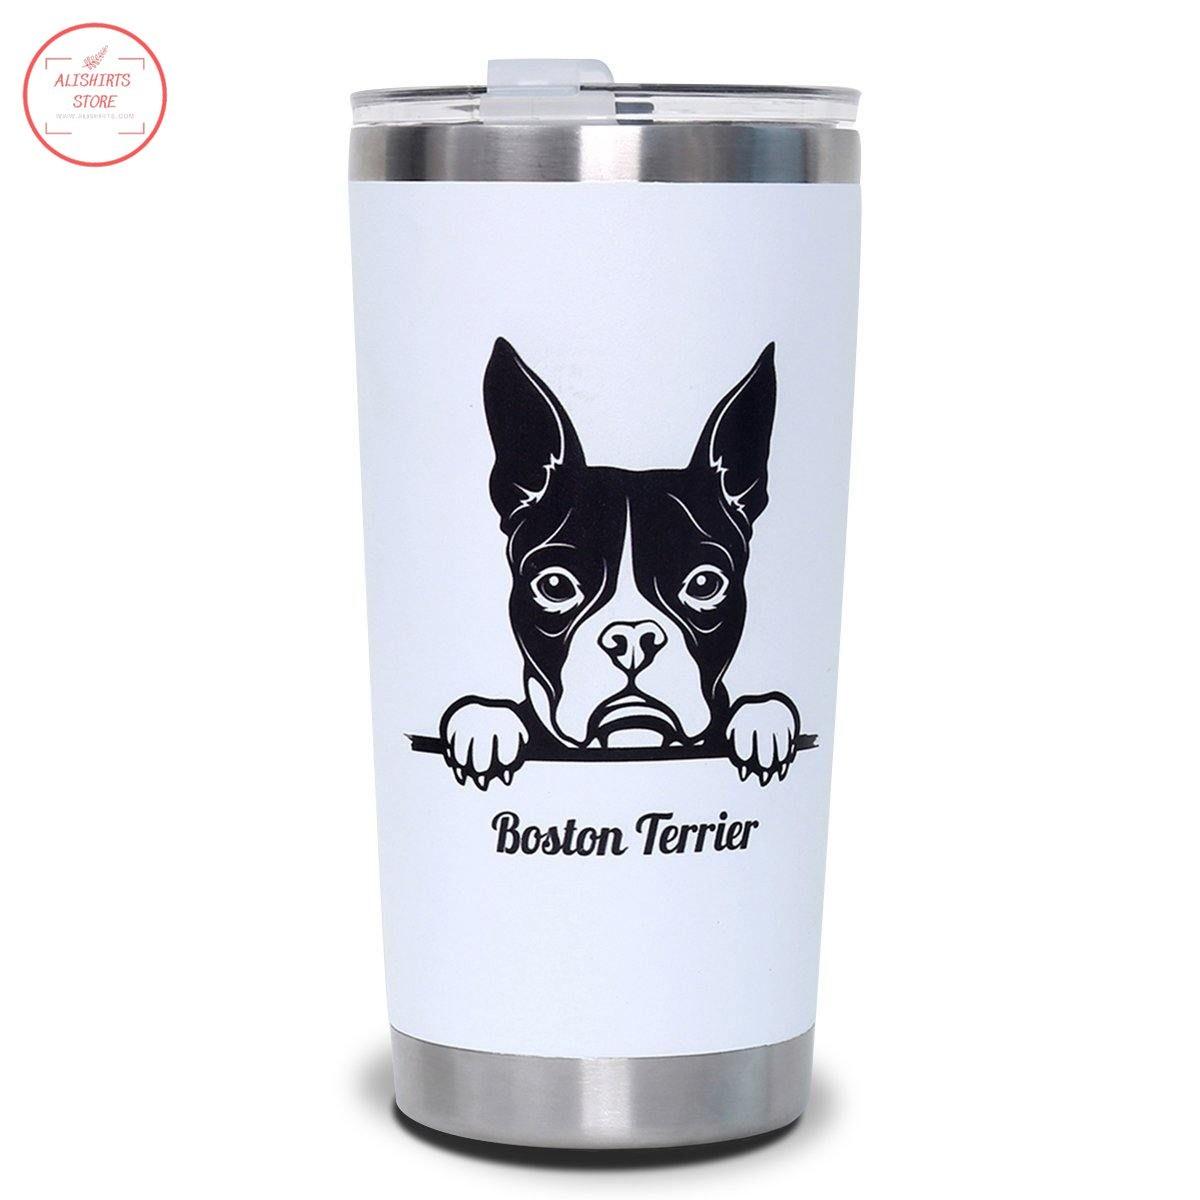 Pet Puppy Dog Tumbler